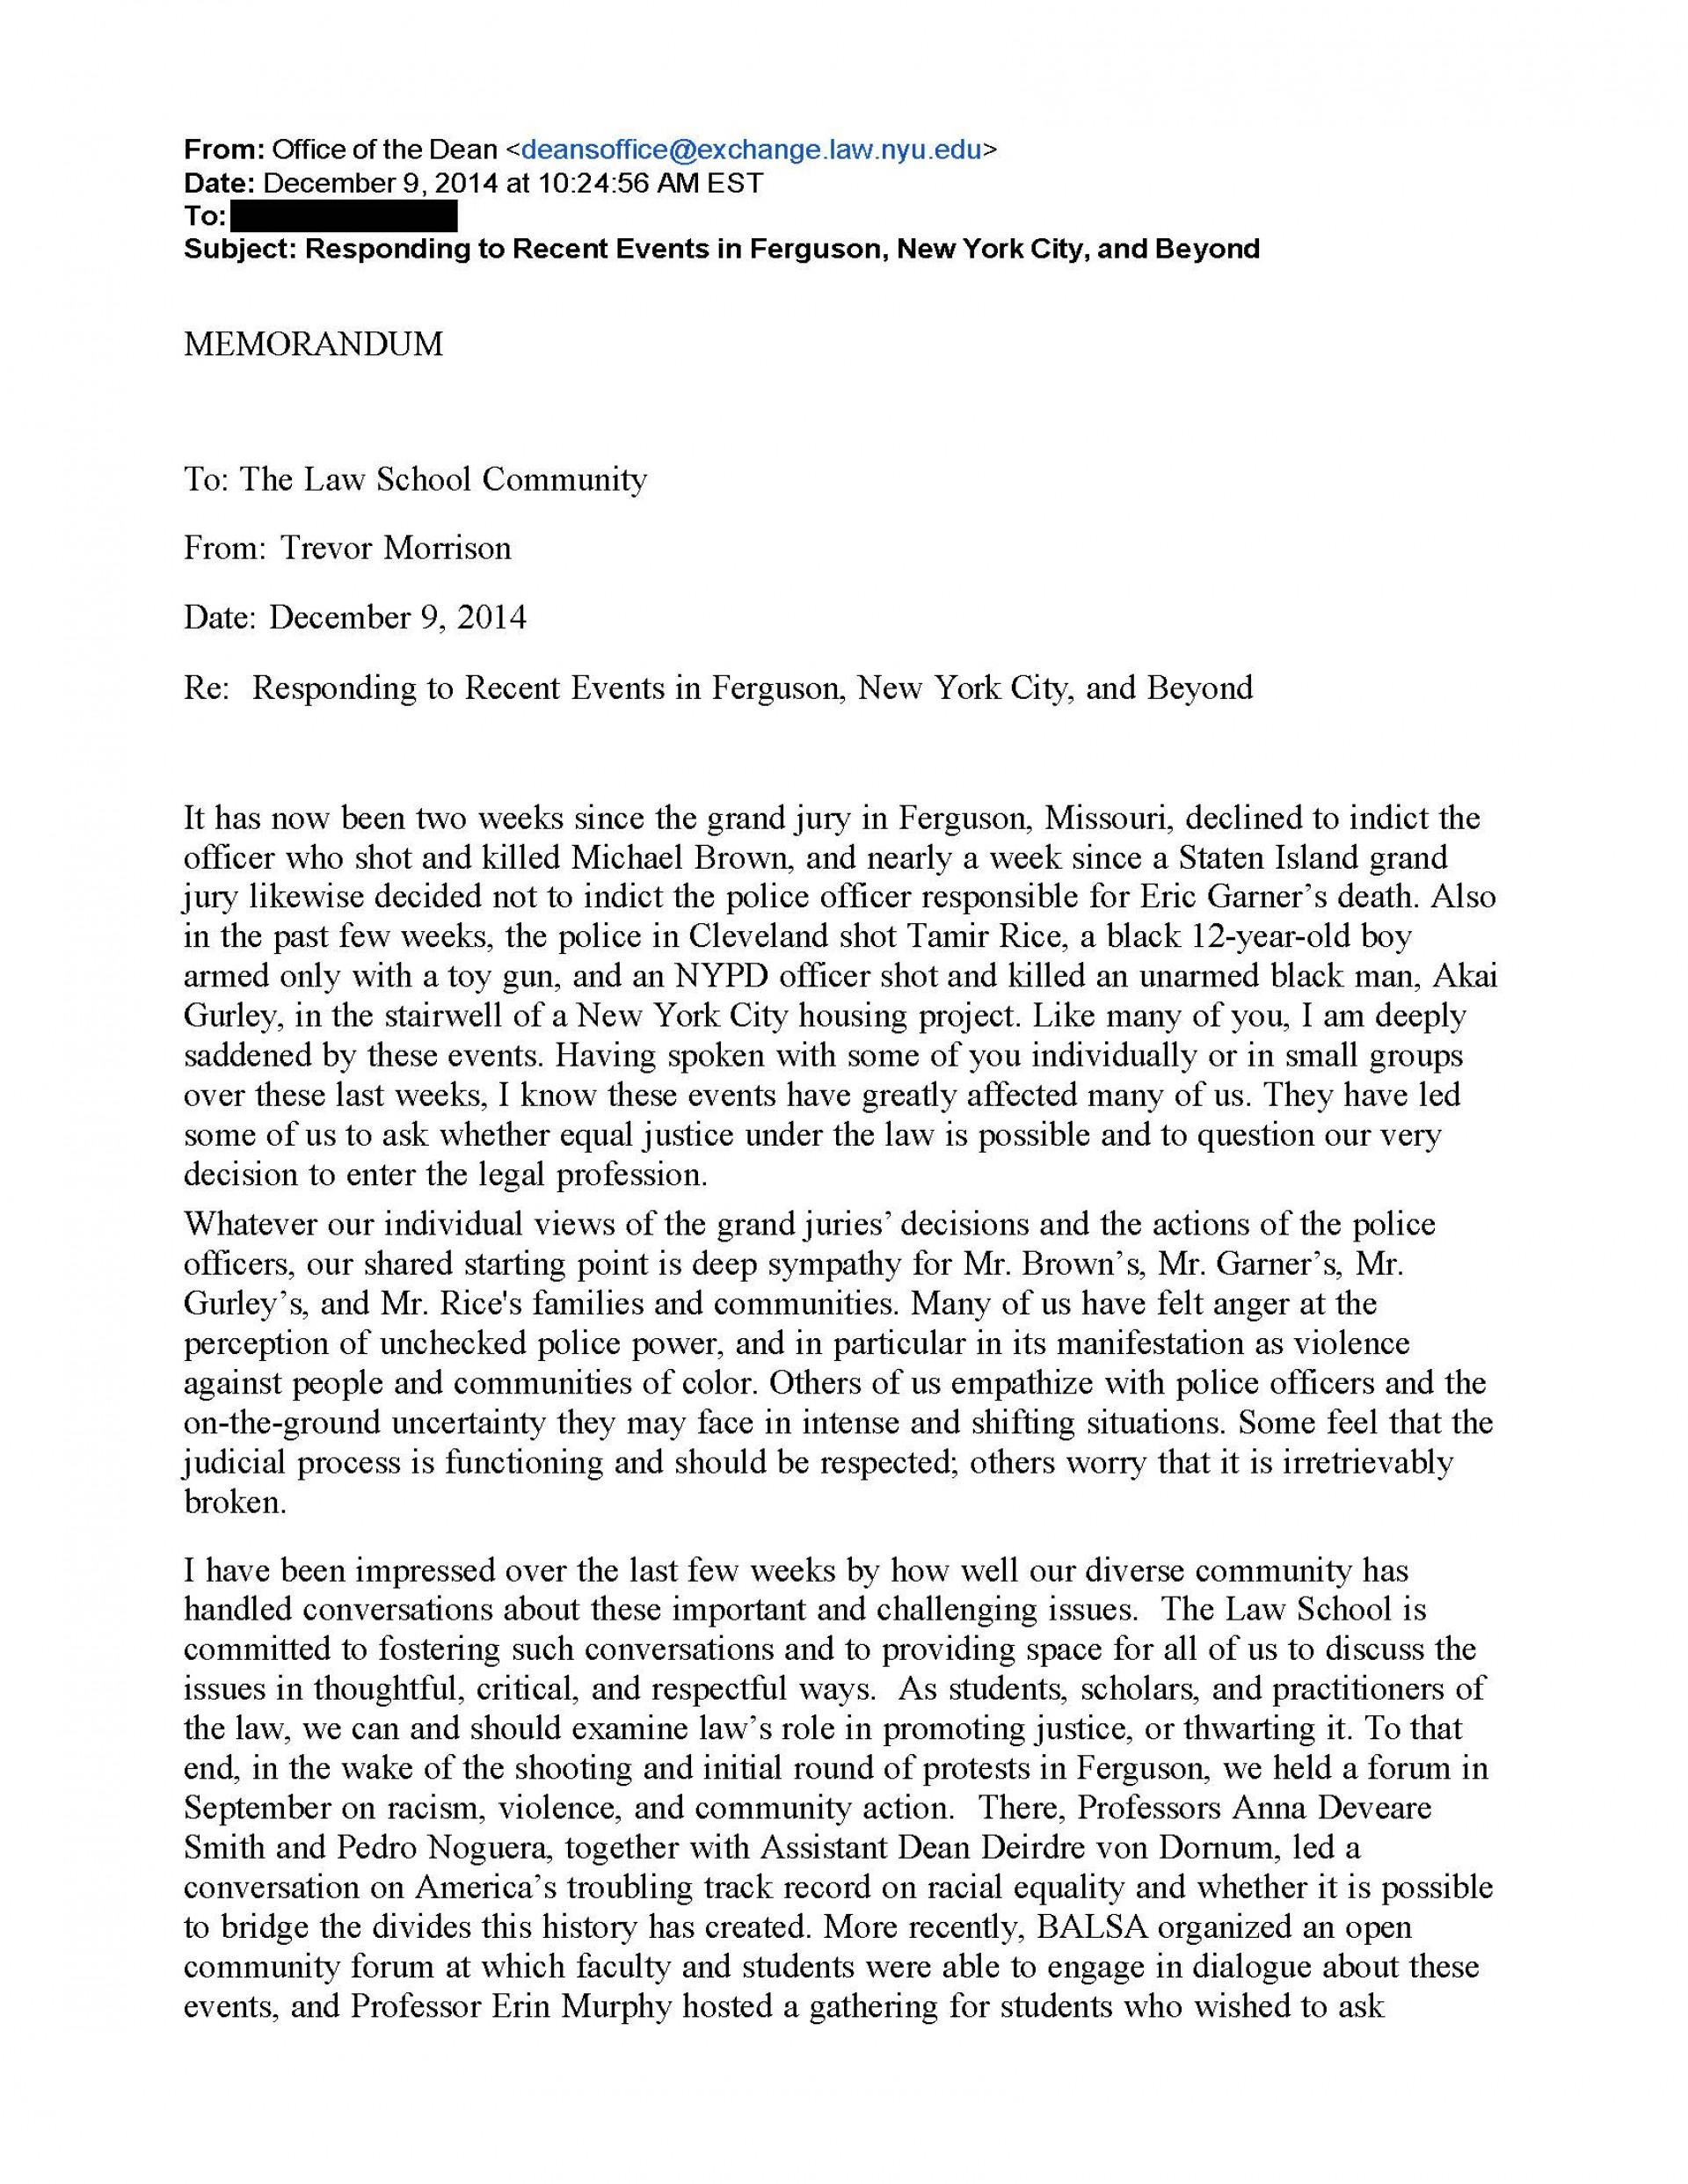 008 Nyu Response 14 Page 1 Essay Example Supplement Wondrous 2017 1920